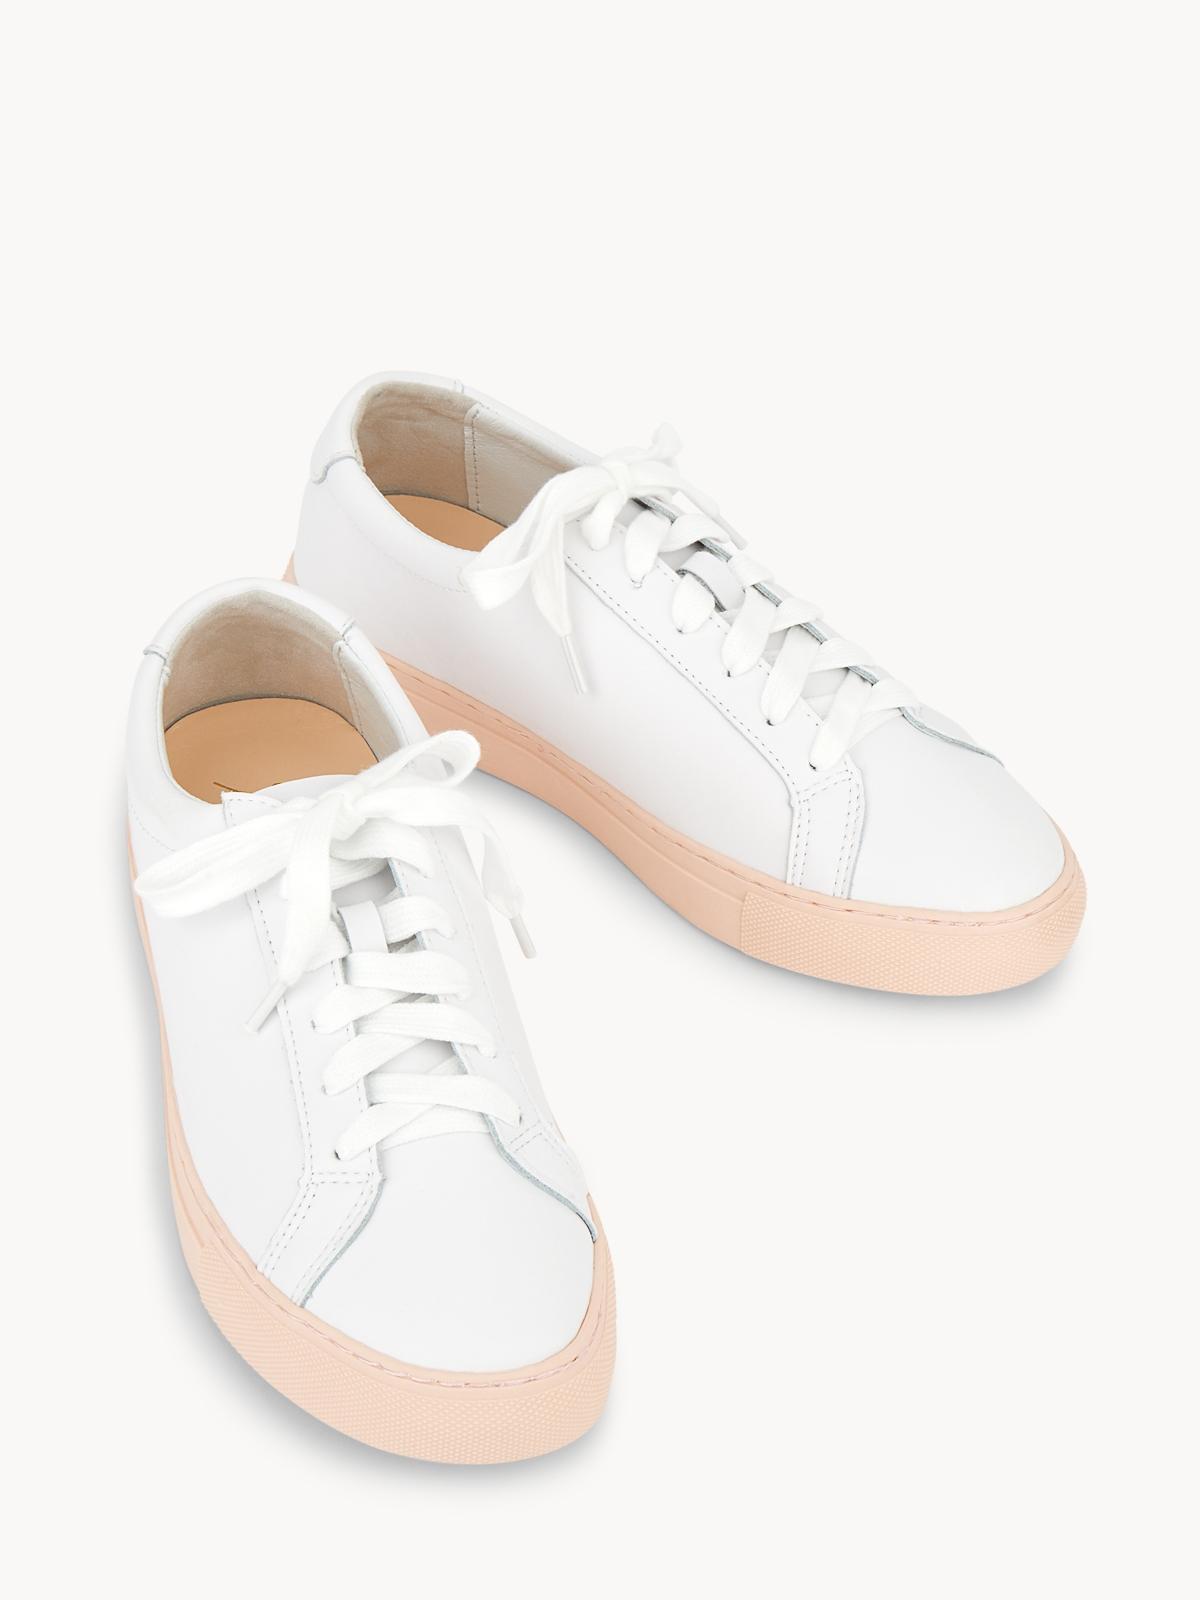 Starkela Sneakers Pink